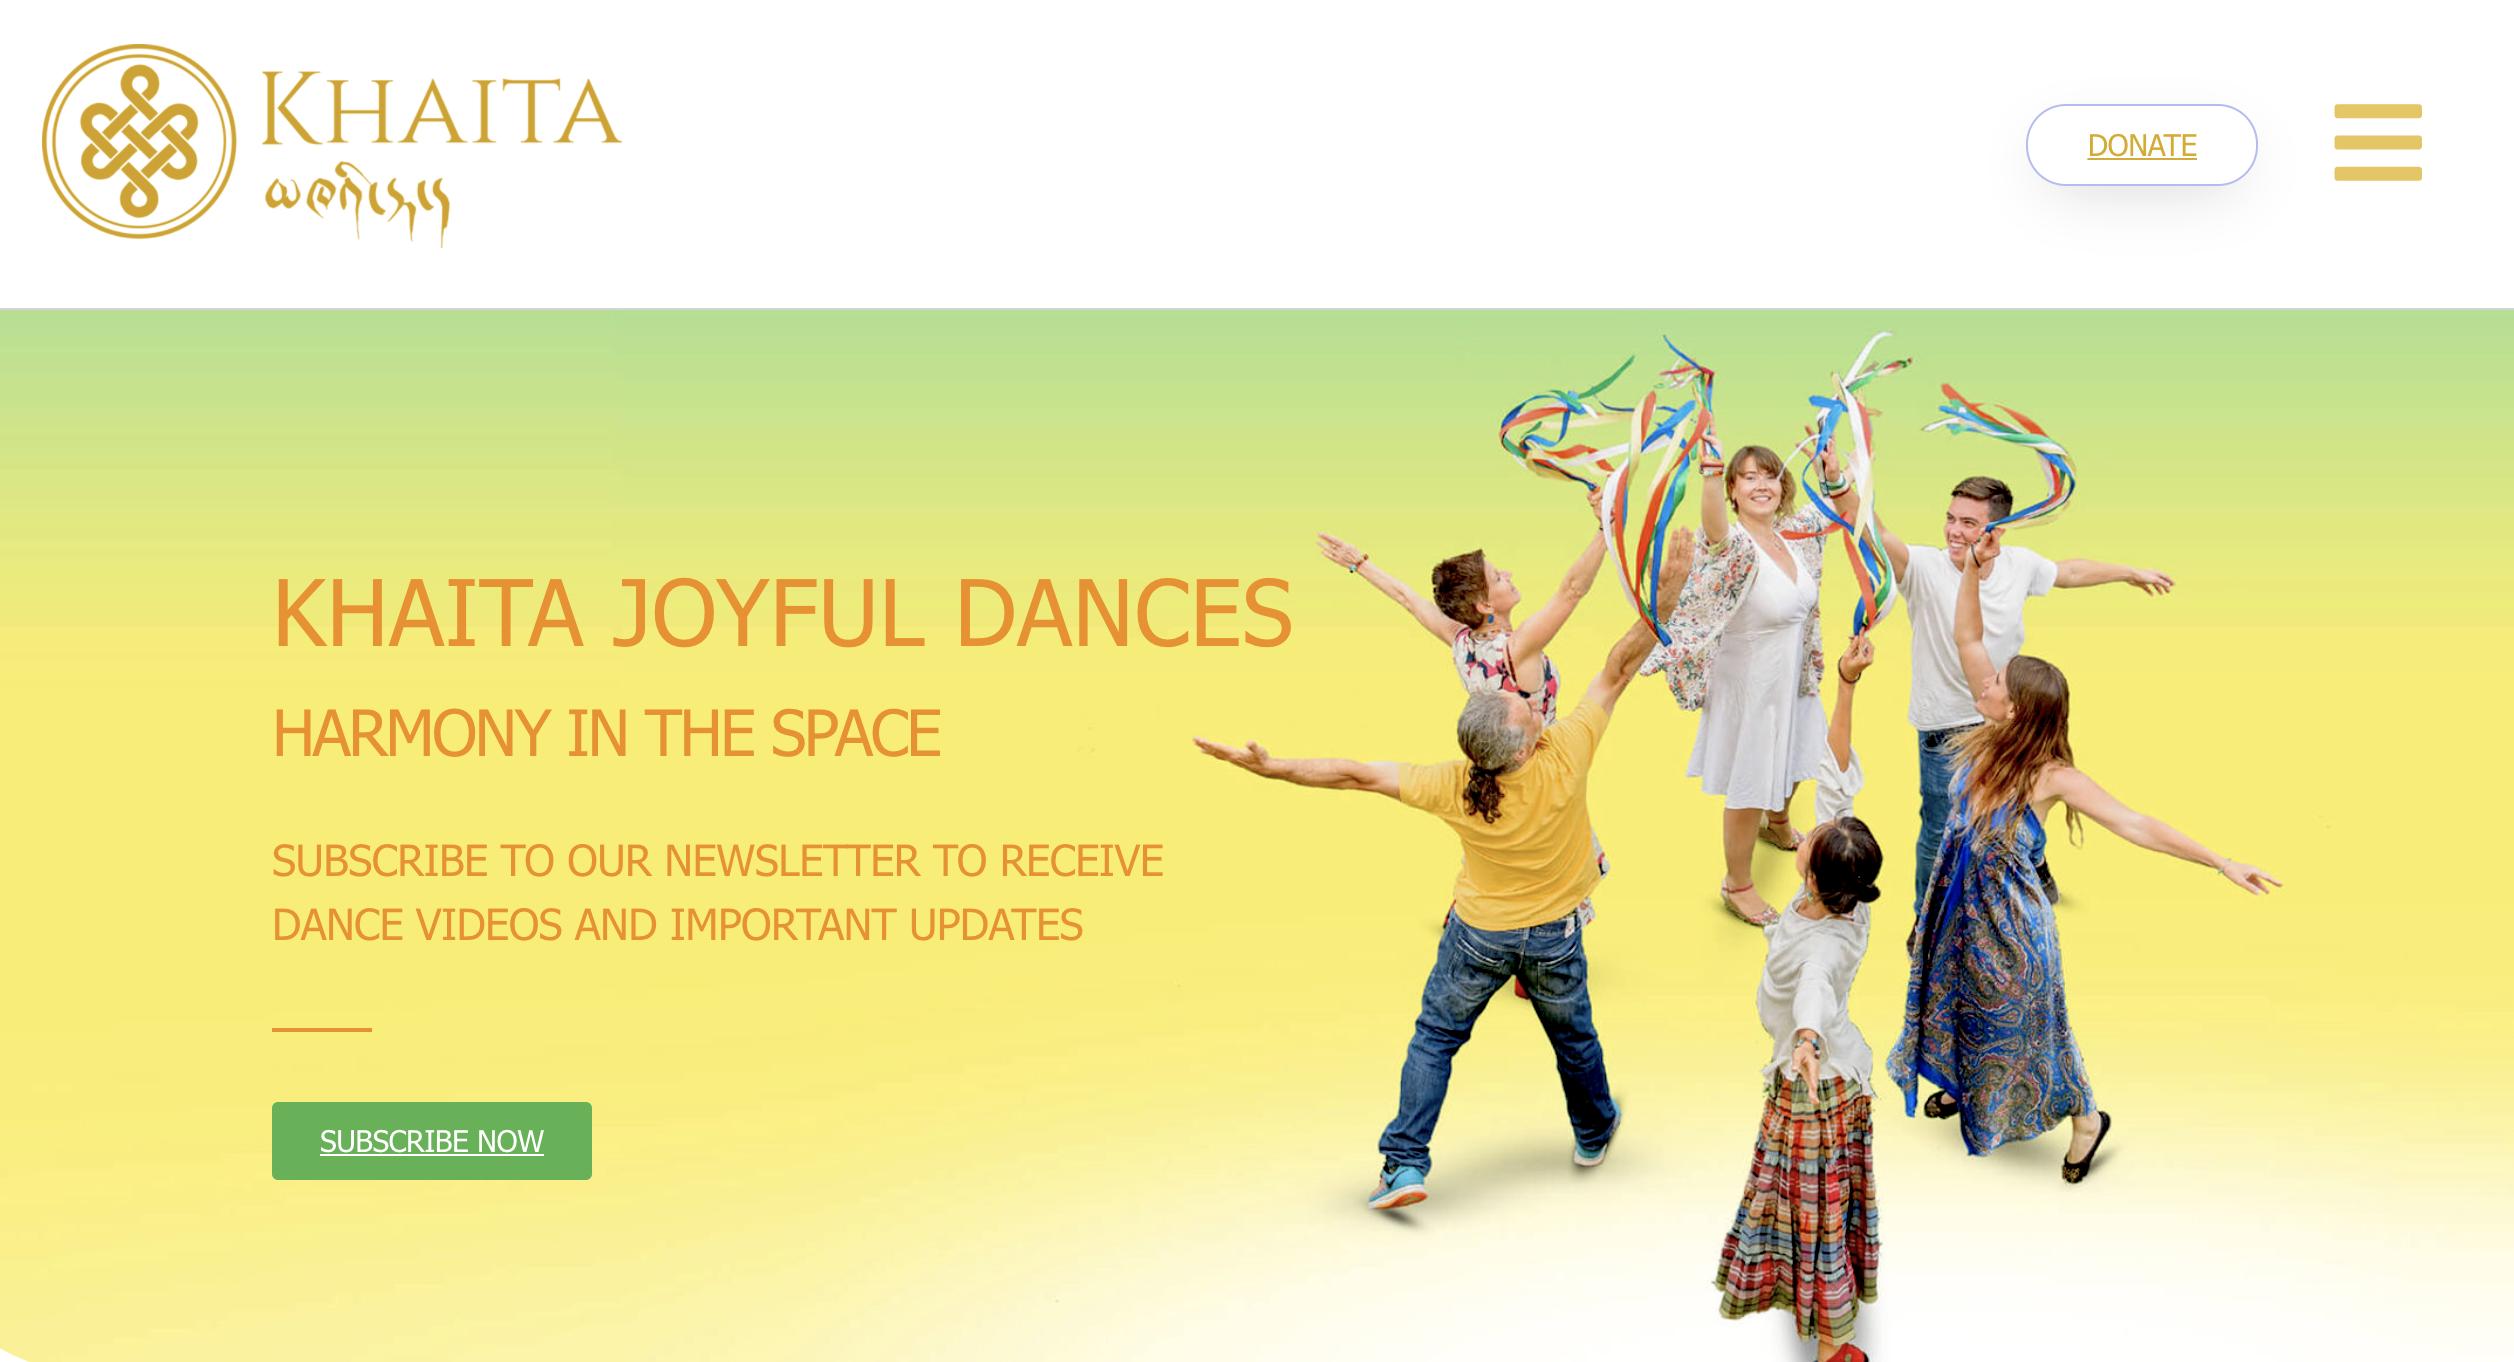 New Khaita Website